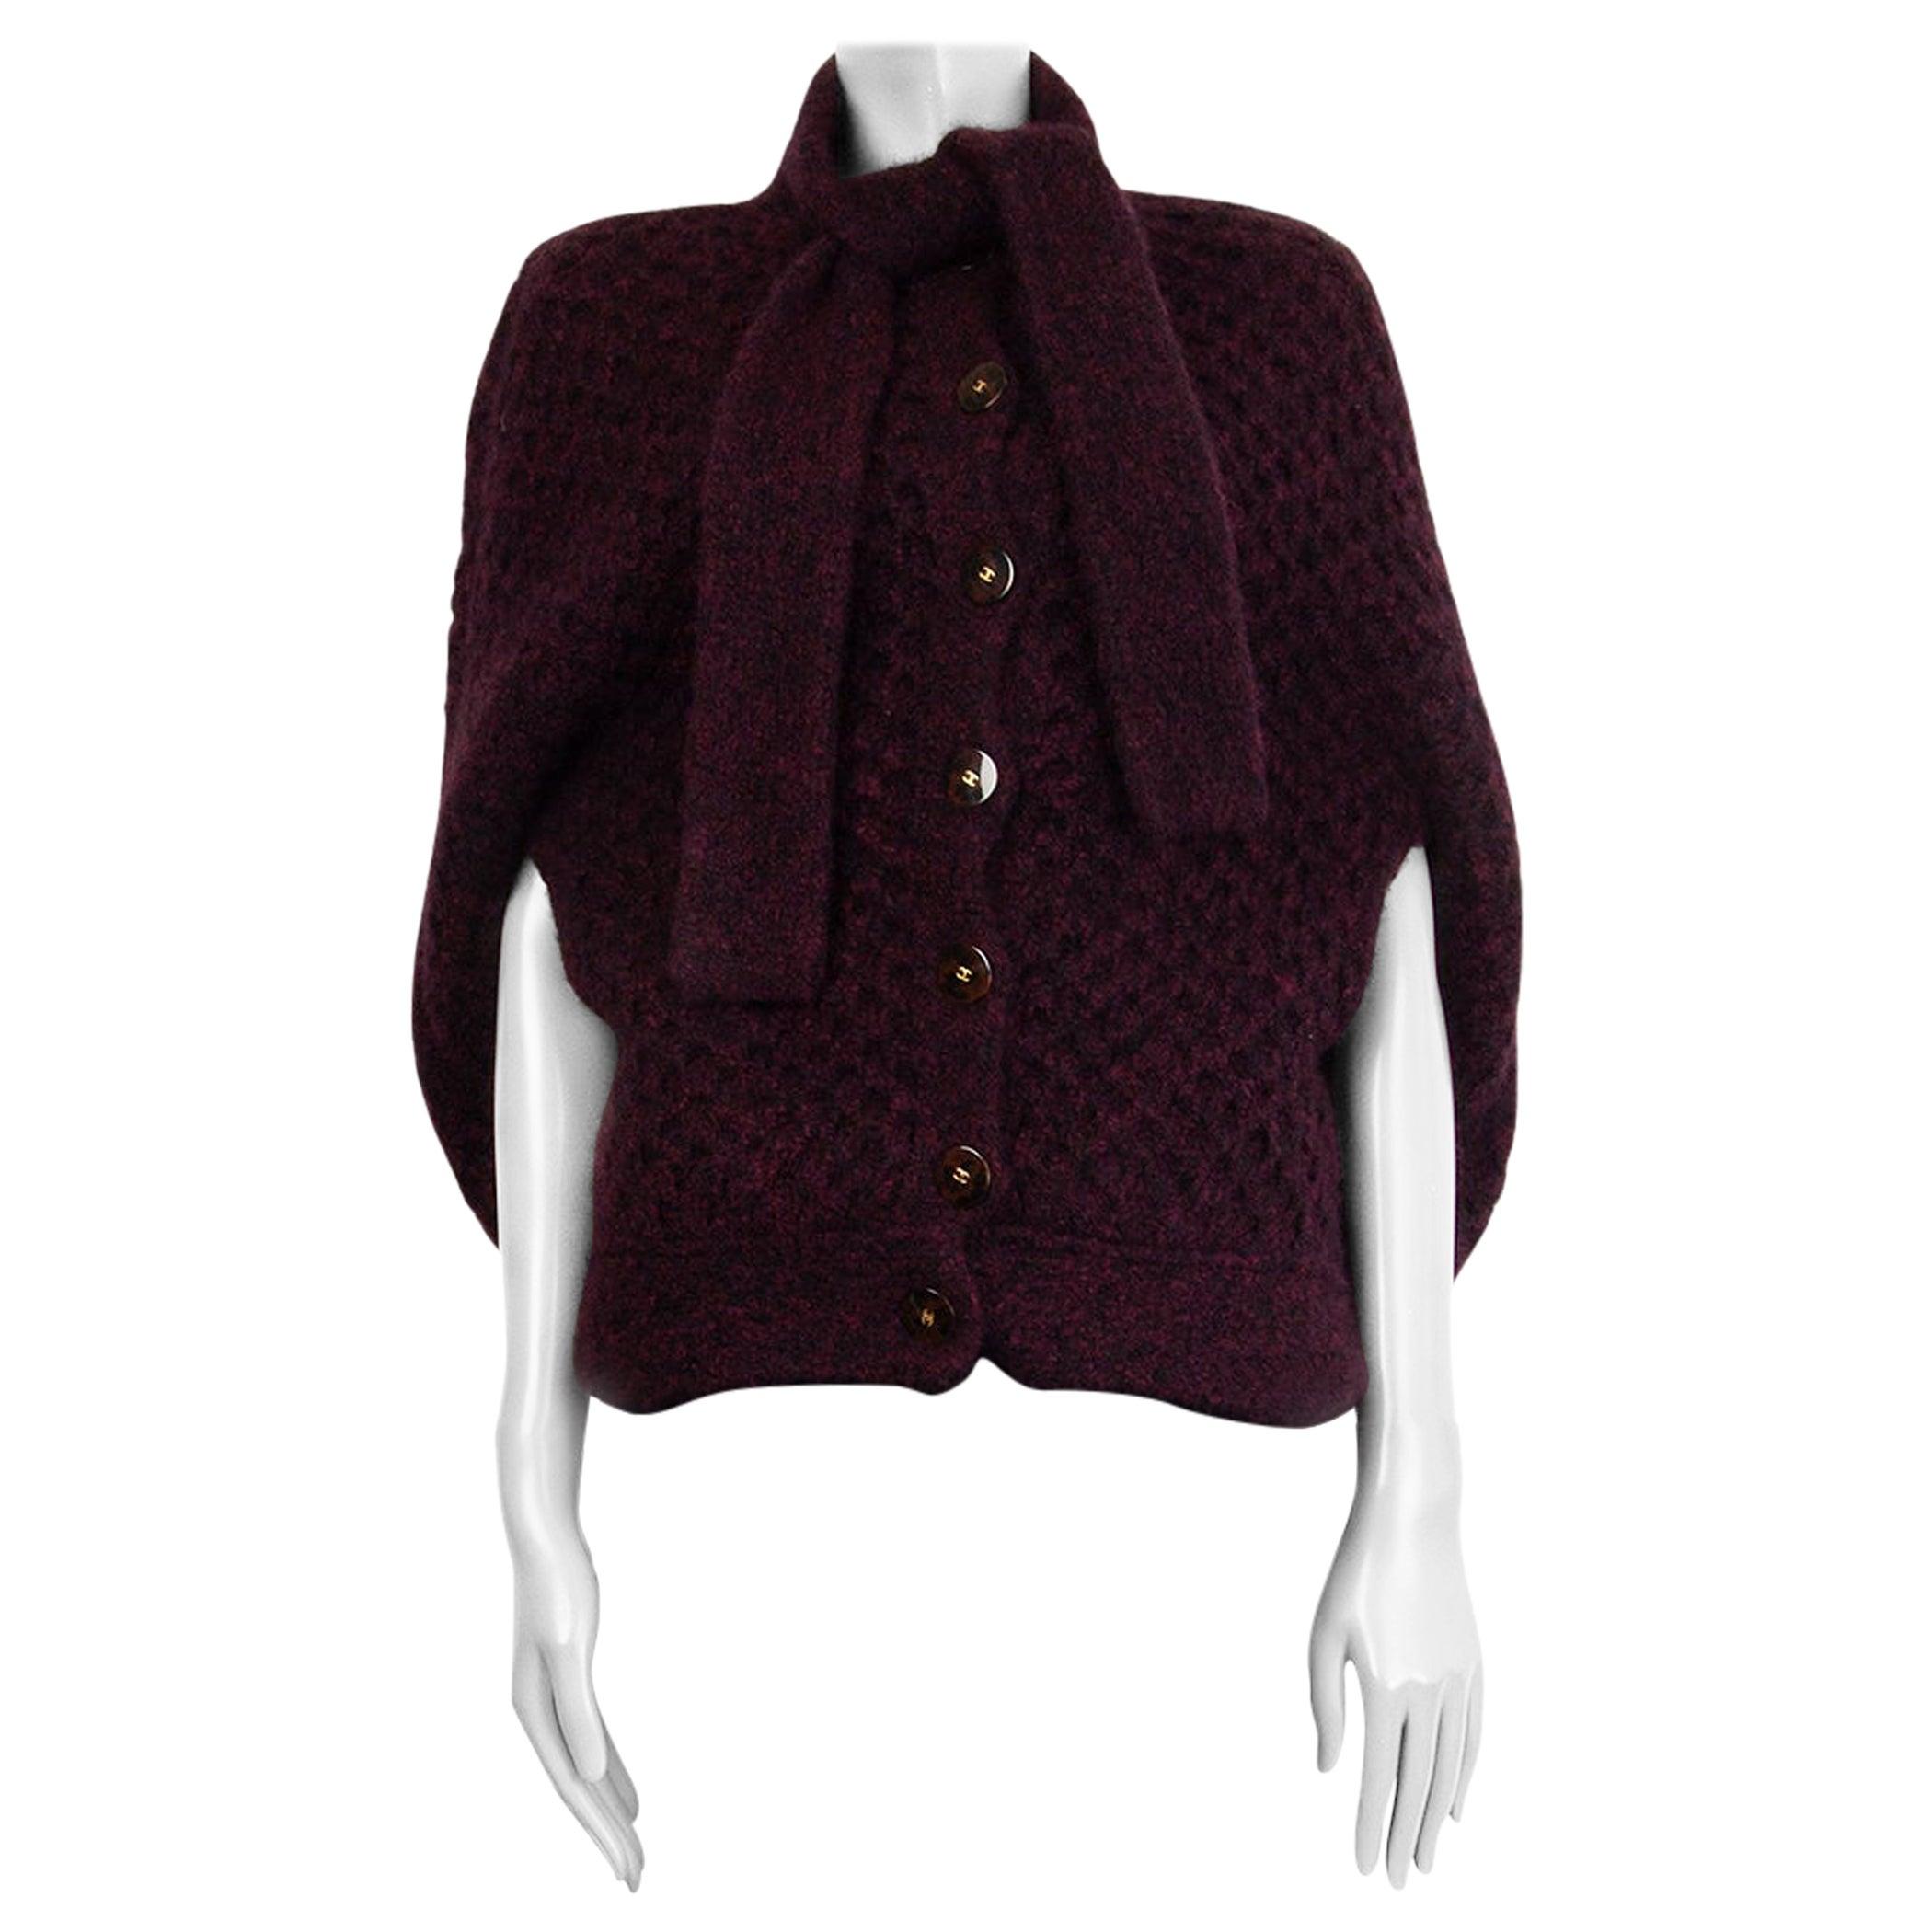 CHANEL burgundy cashmere COSMOPOLITE Cape Jacket 34 36 XS